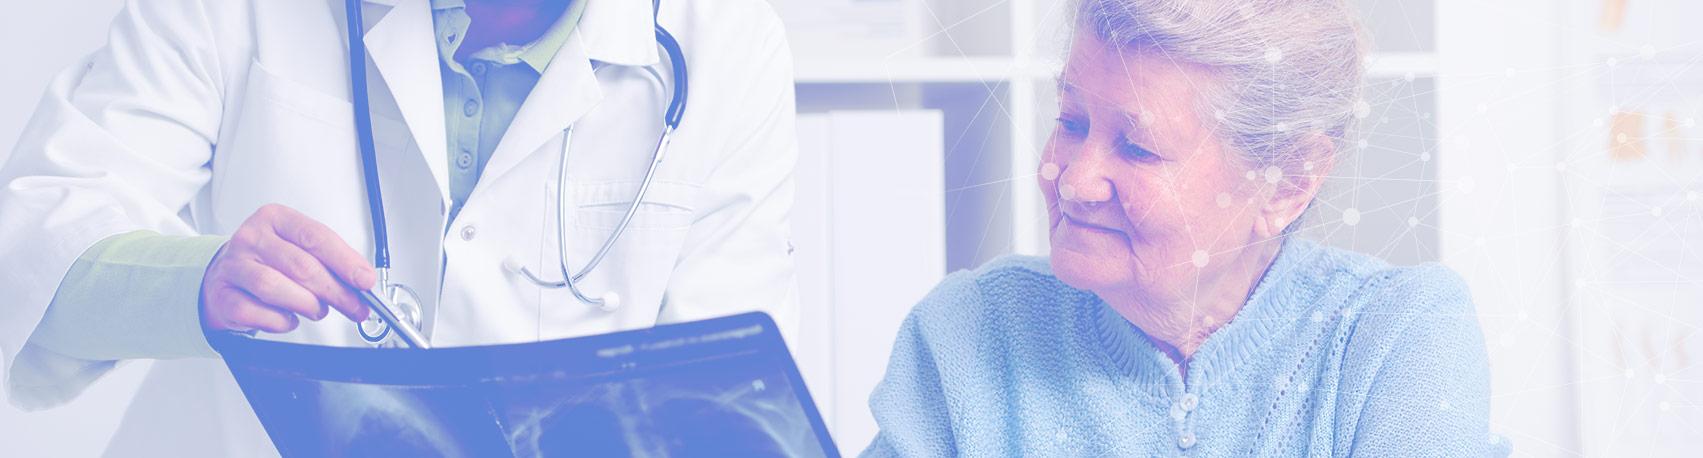 French Days of Radiology